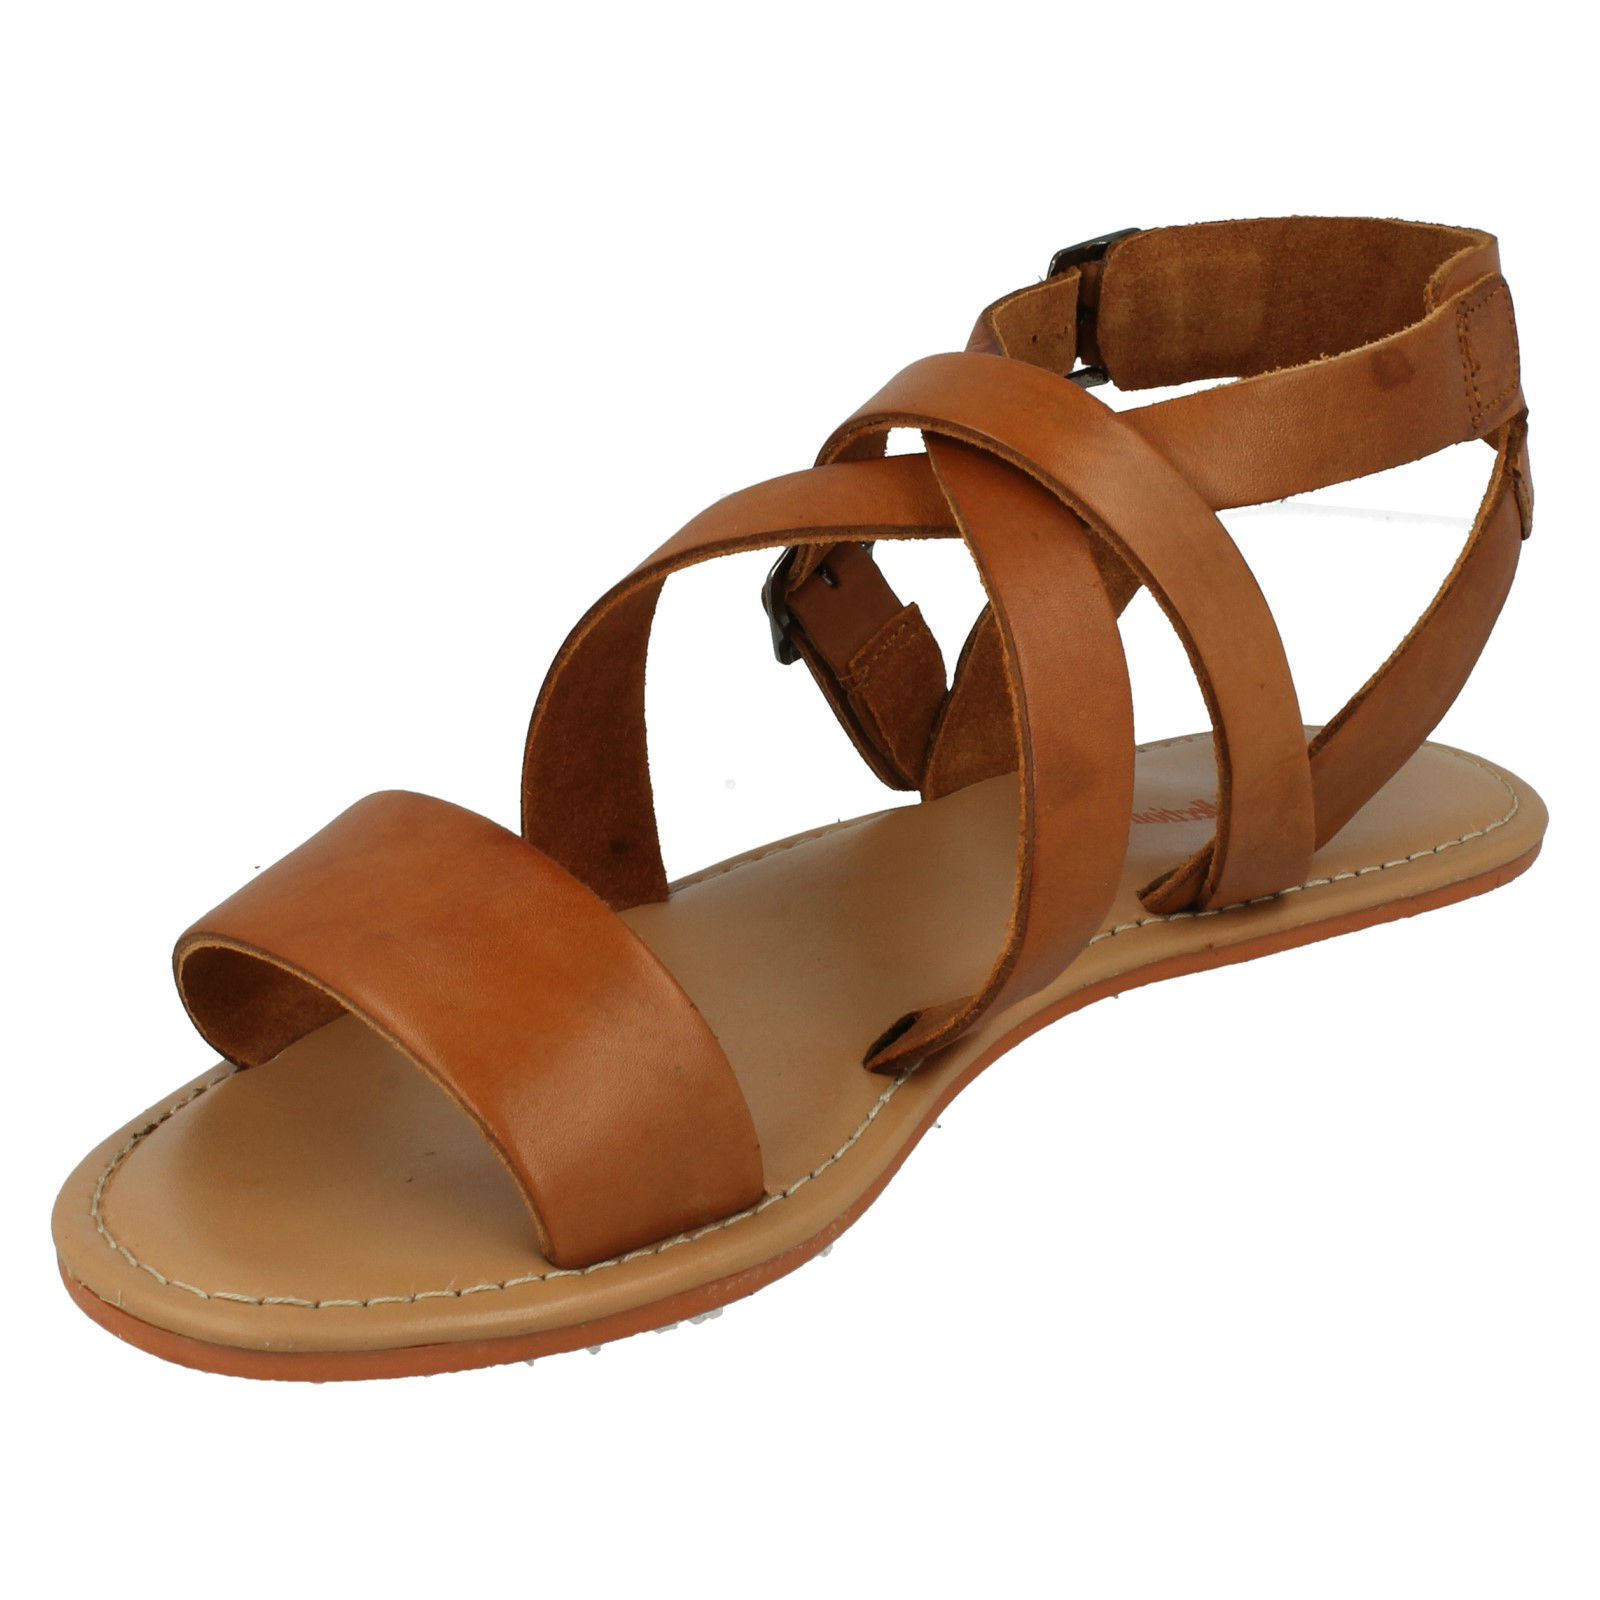 Mujer Leather Leather Collection Sandalias Sandalias Sandalias Estilo f0924s b58541